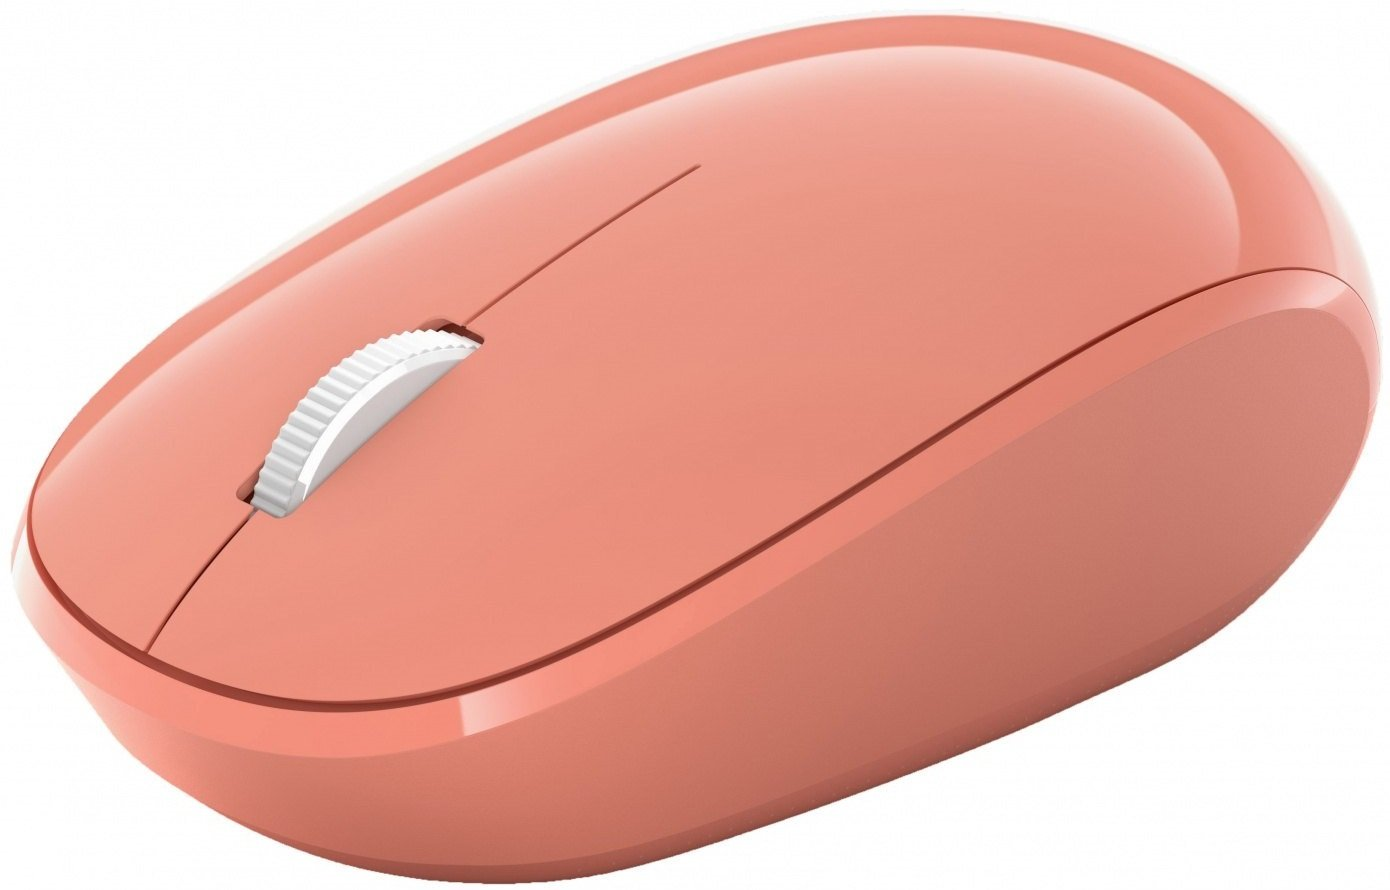 Миша Microsoft Bluetooth Peach (RJN-00046) фото